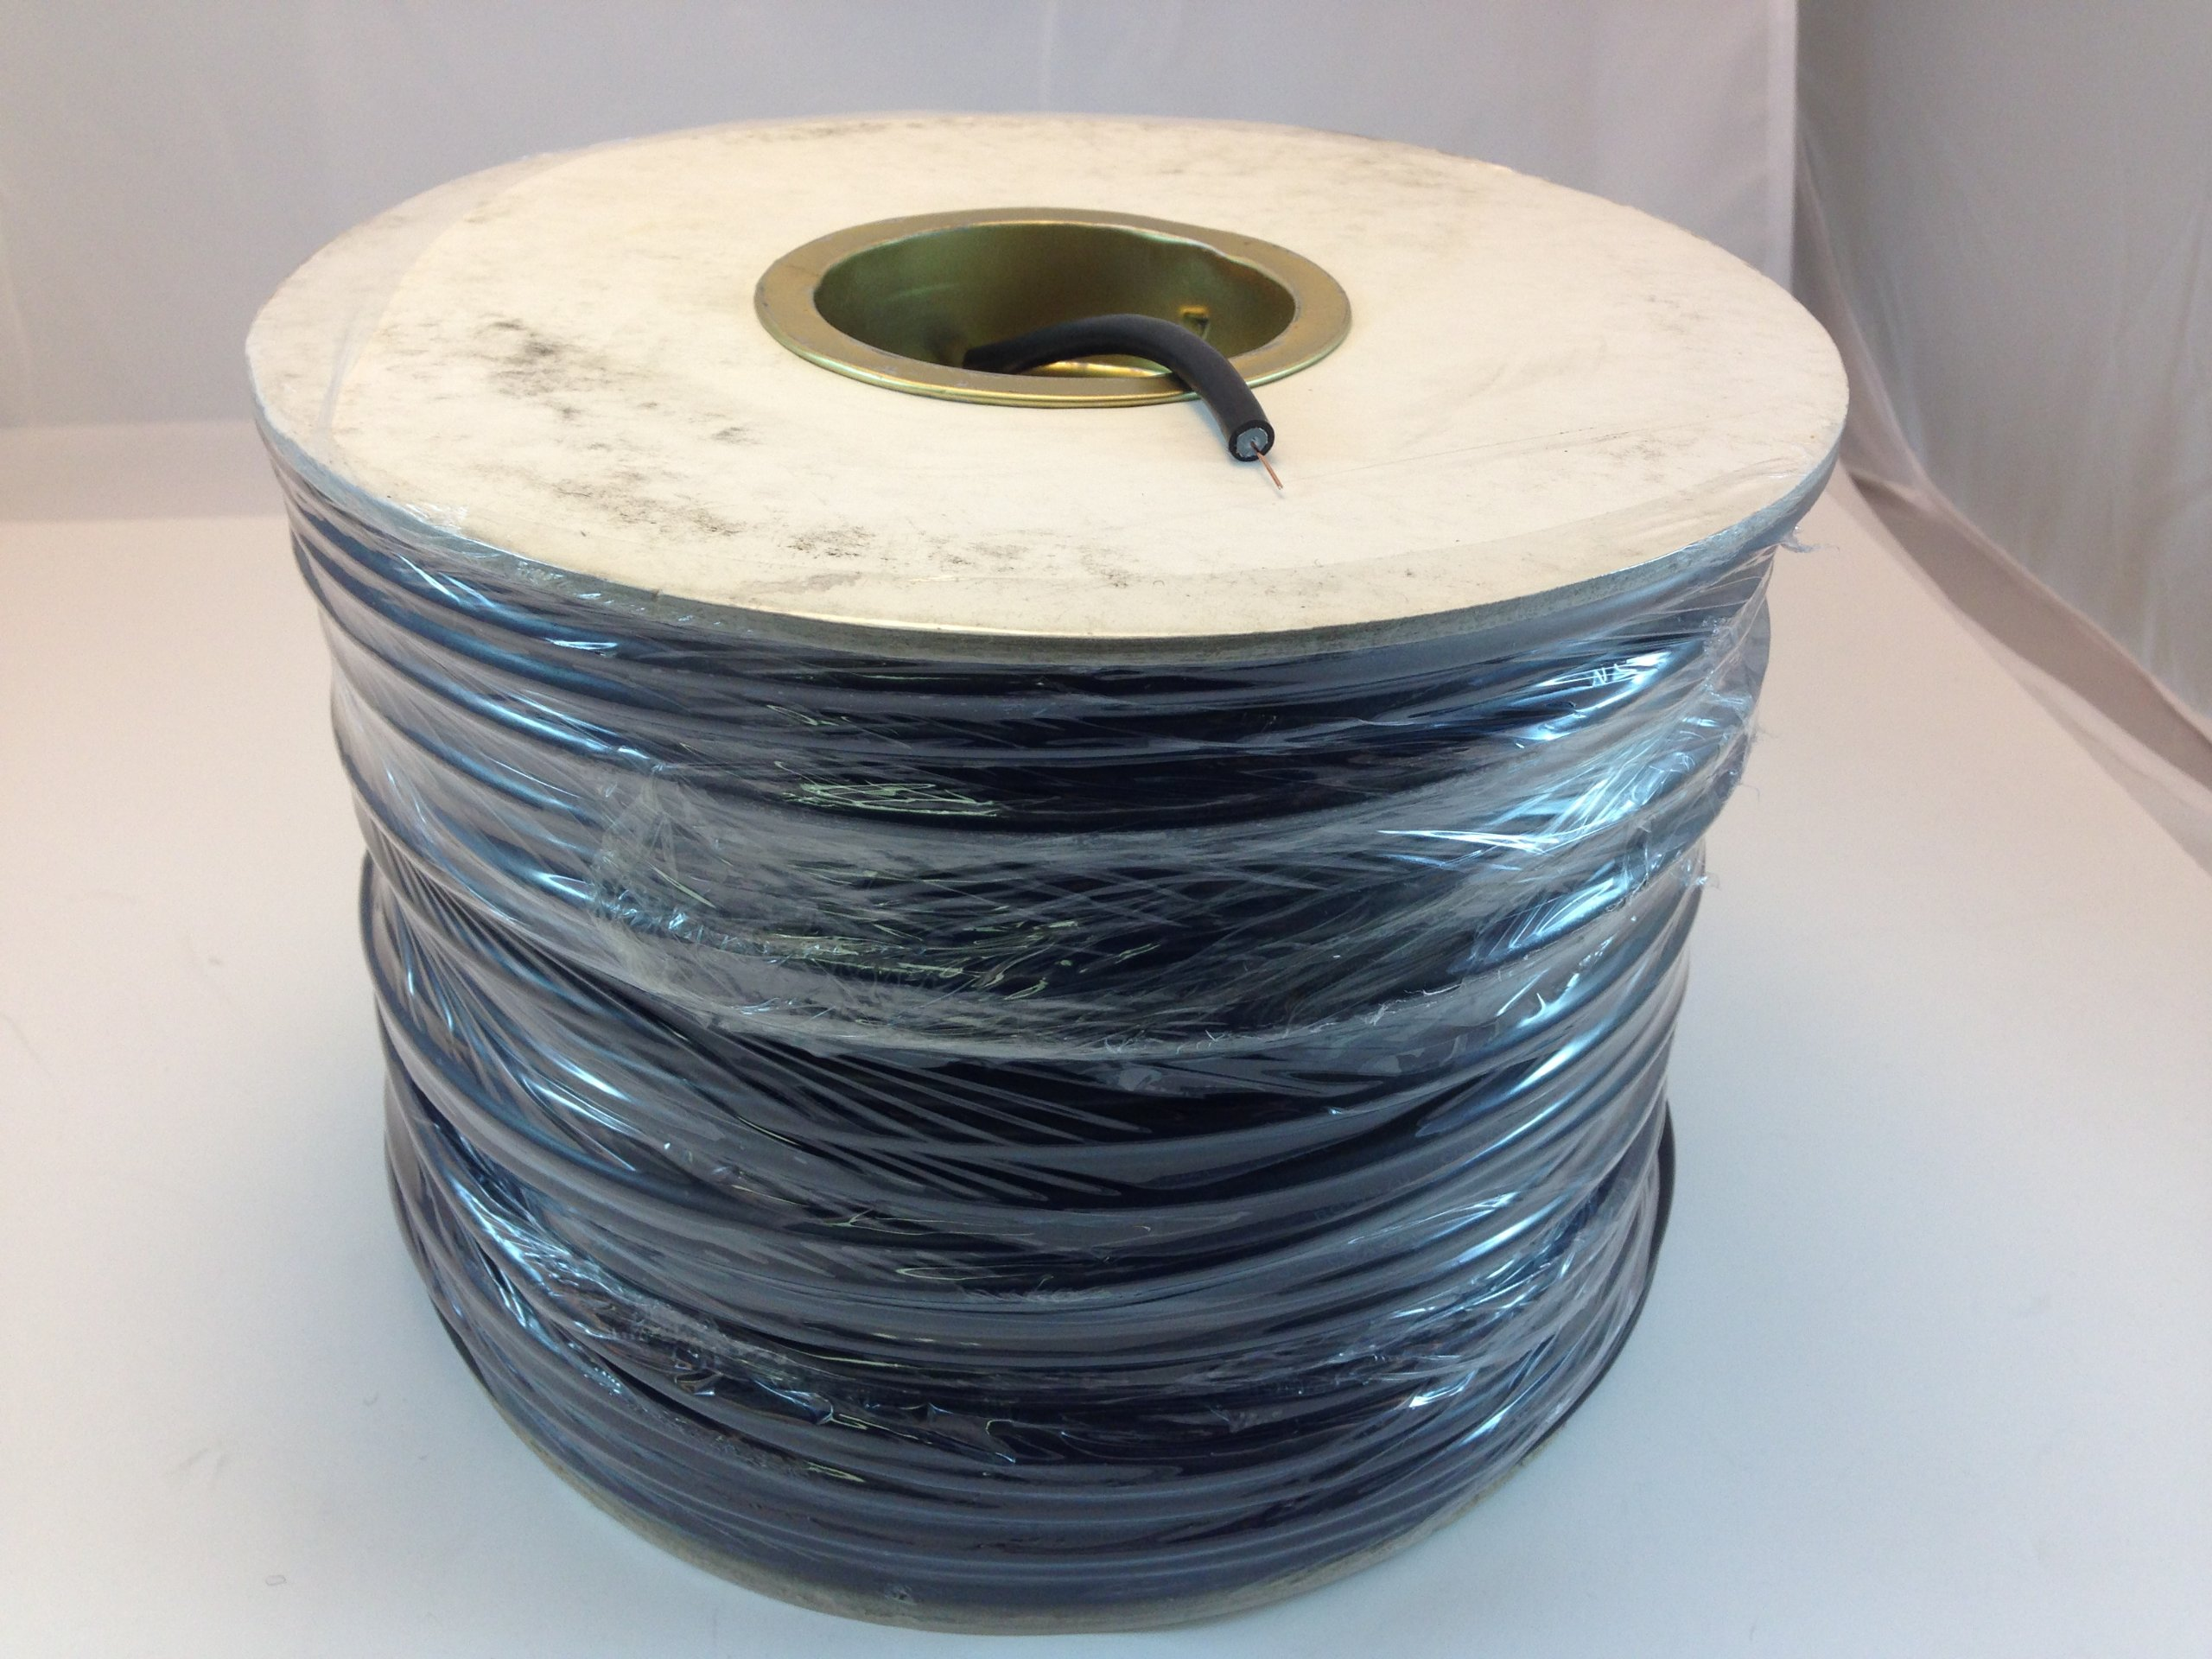 RG59U 500FT ROLL COAXIAL CABLE BLACK FOIL & BRAID SHIELD